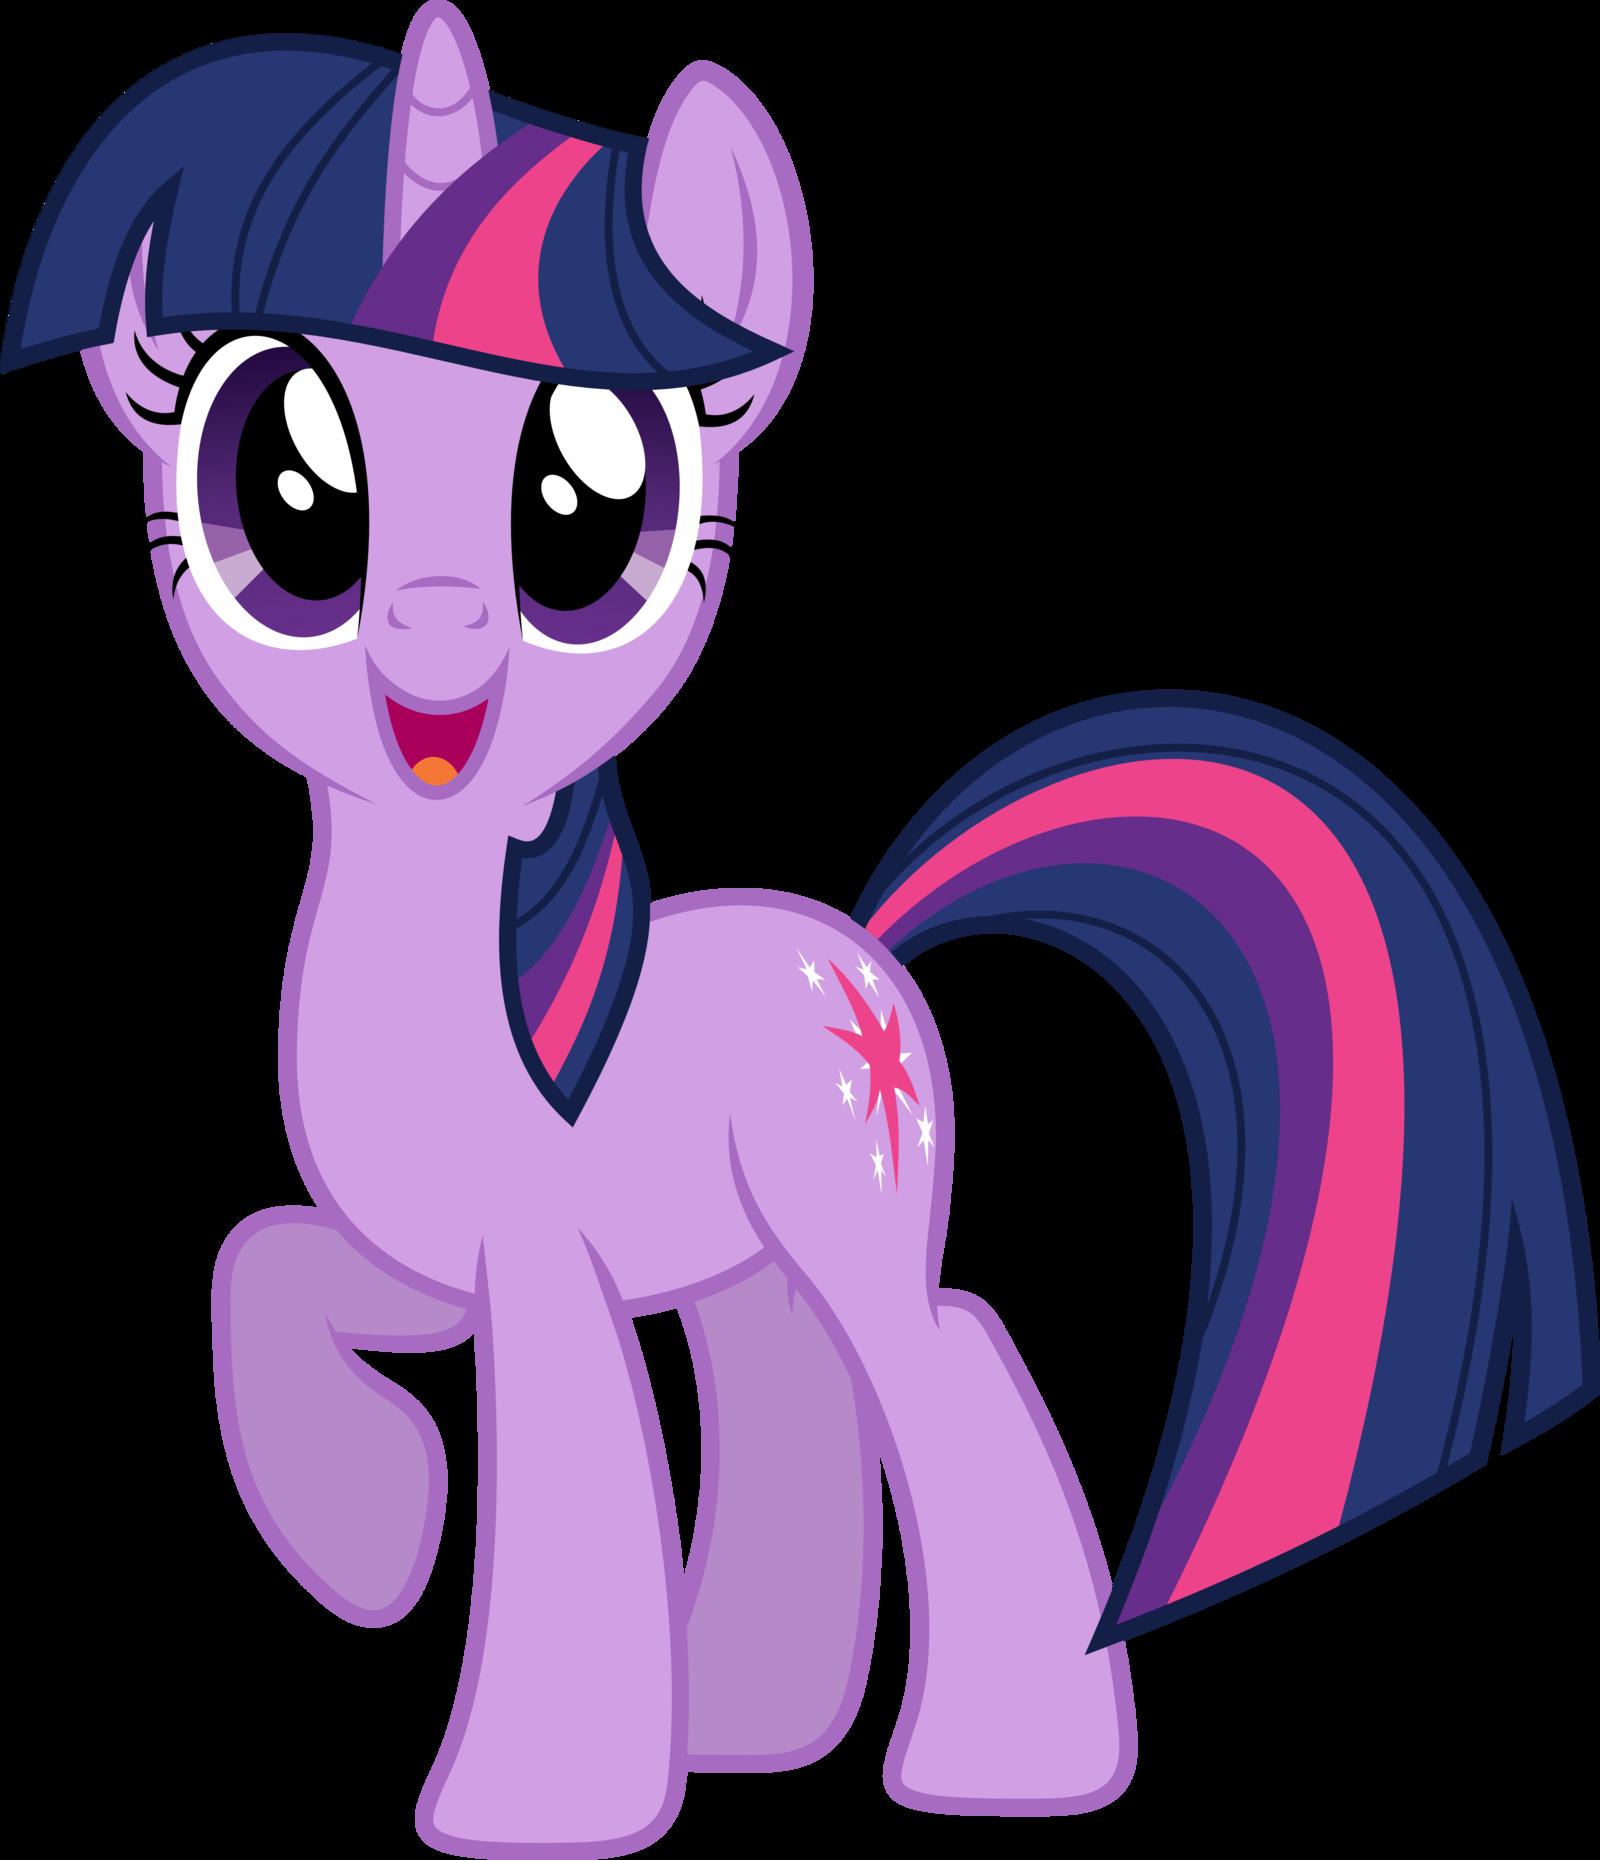 twlight sparkle my little pony friendship is magic know your meme